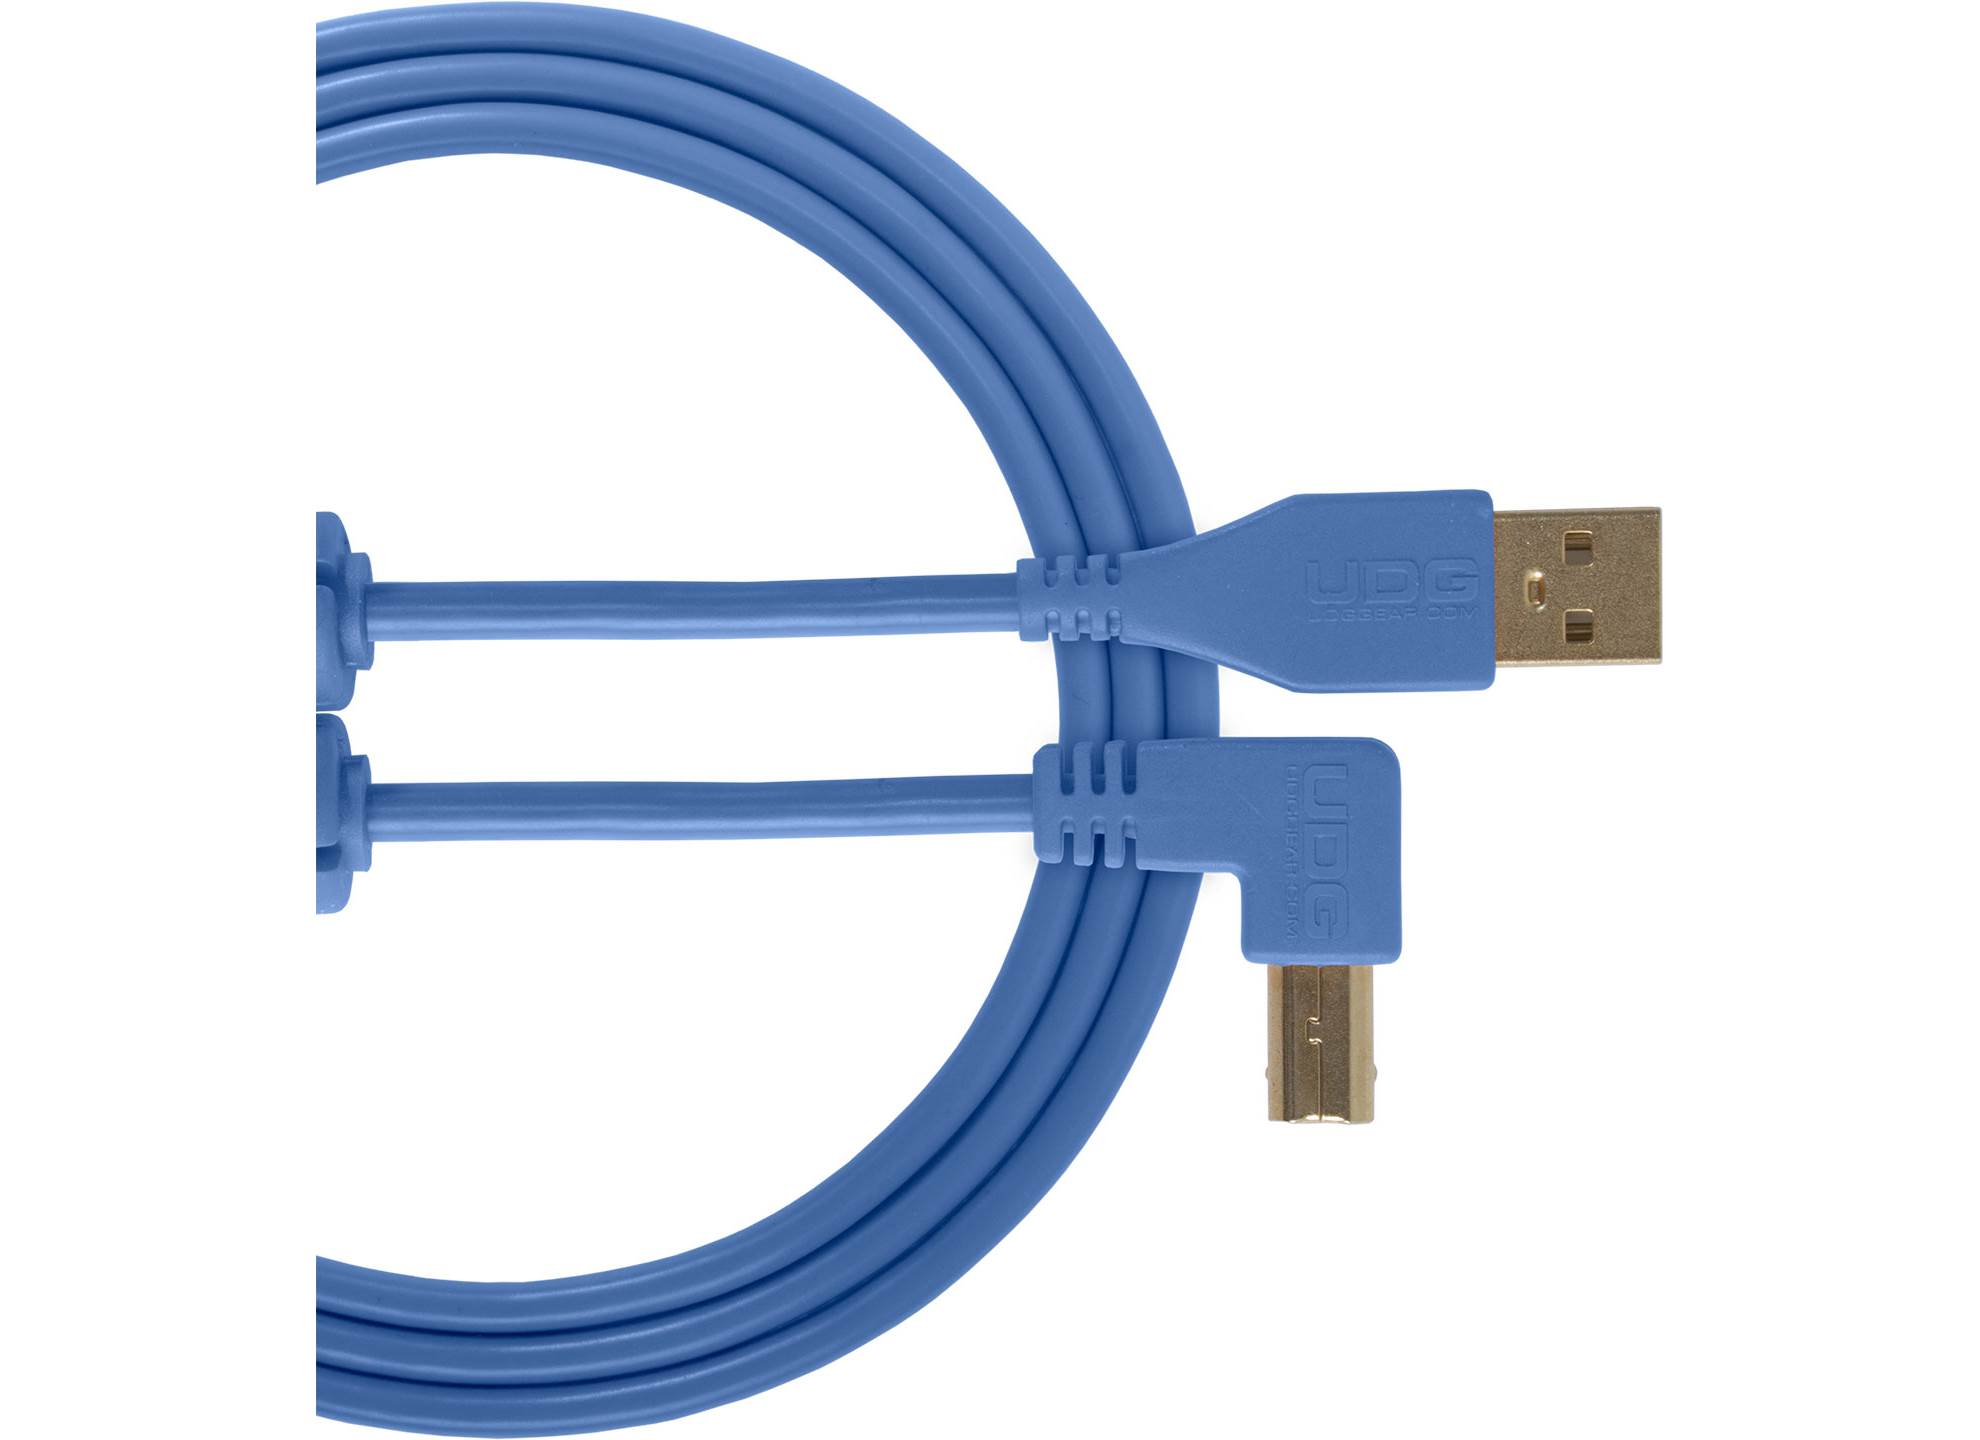 Ultimate USB 2.0 A-B Blue Angled 1m